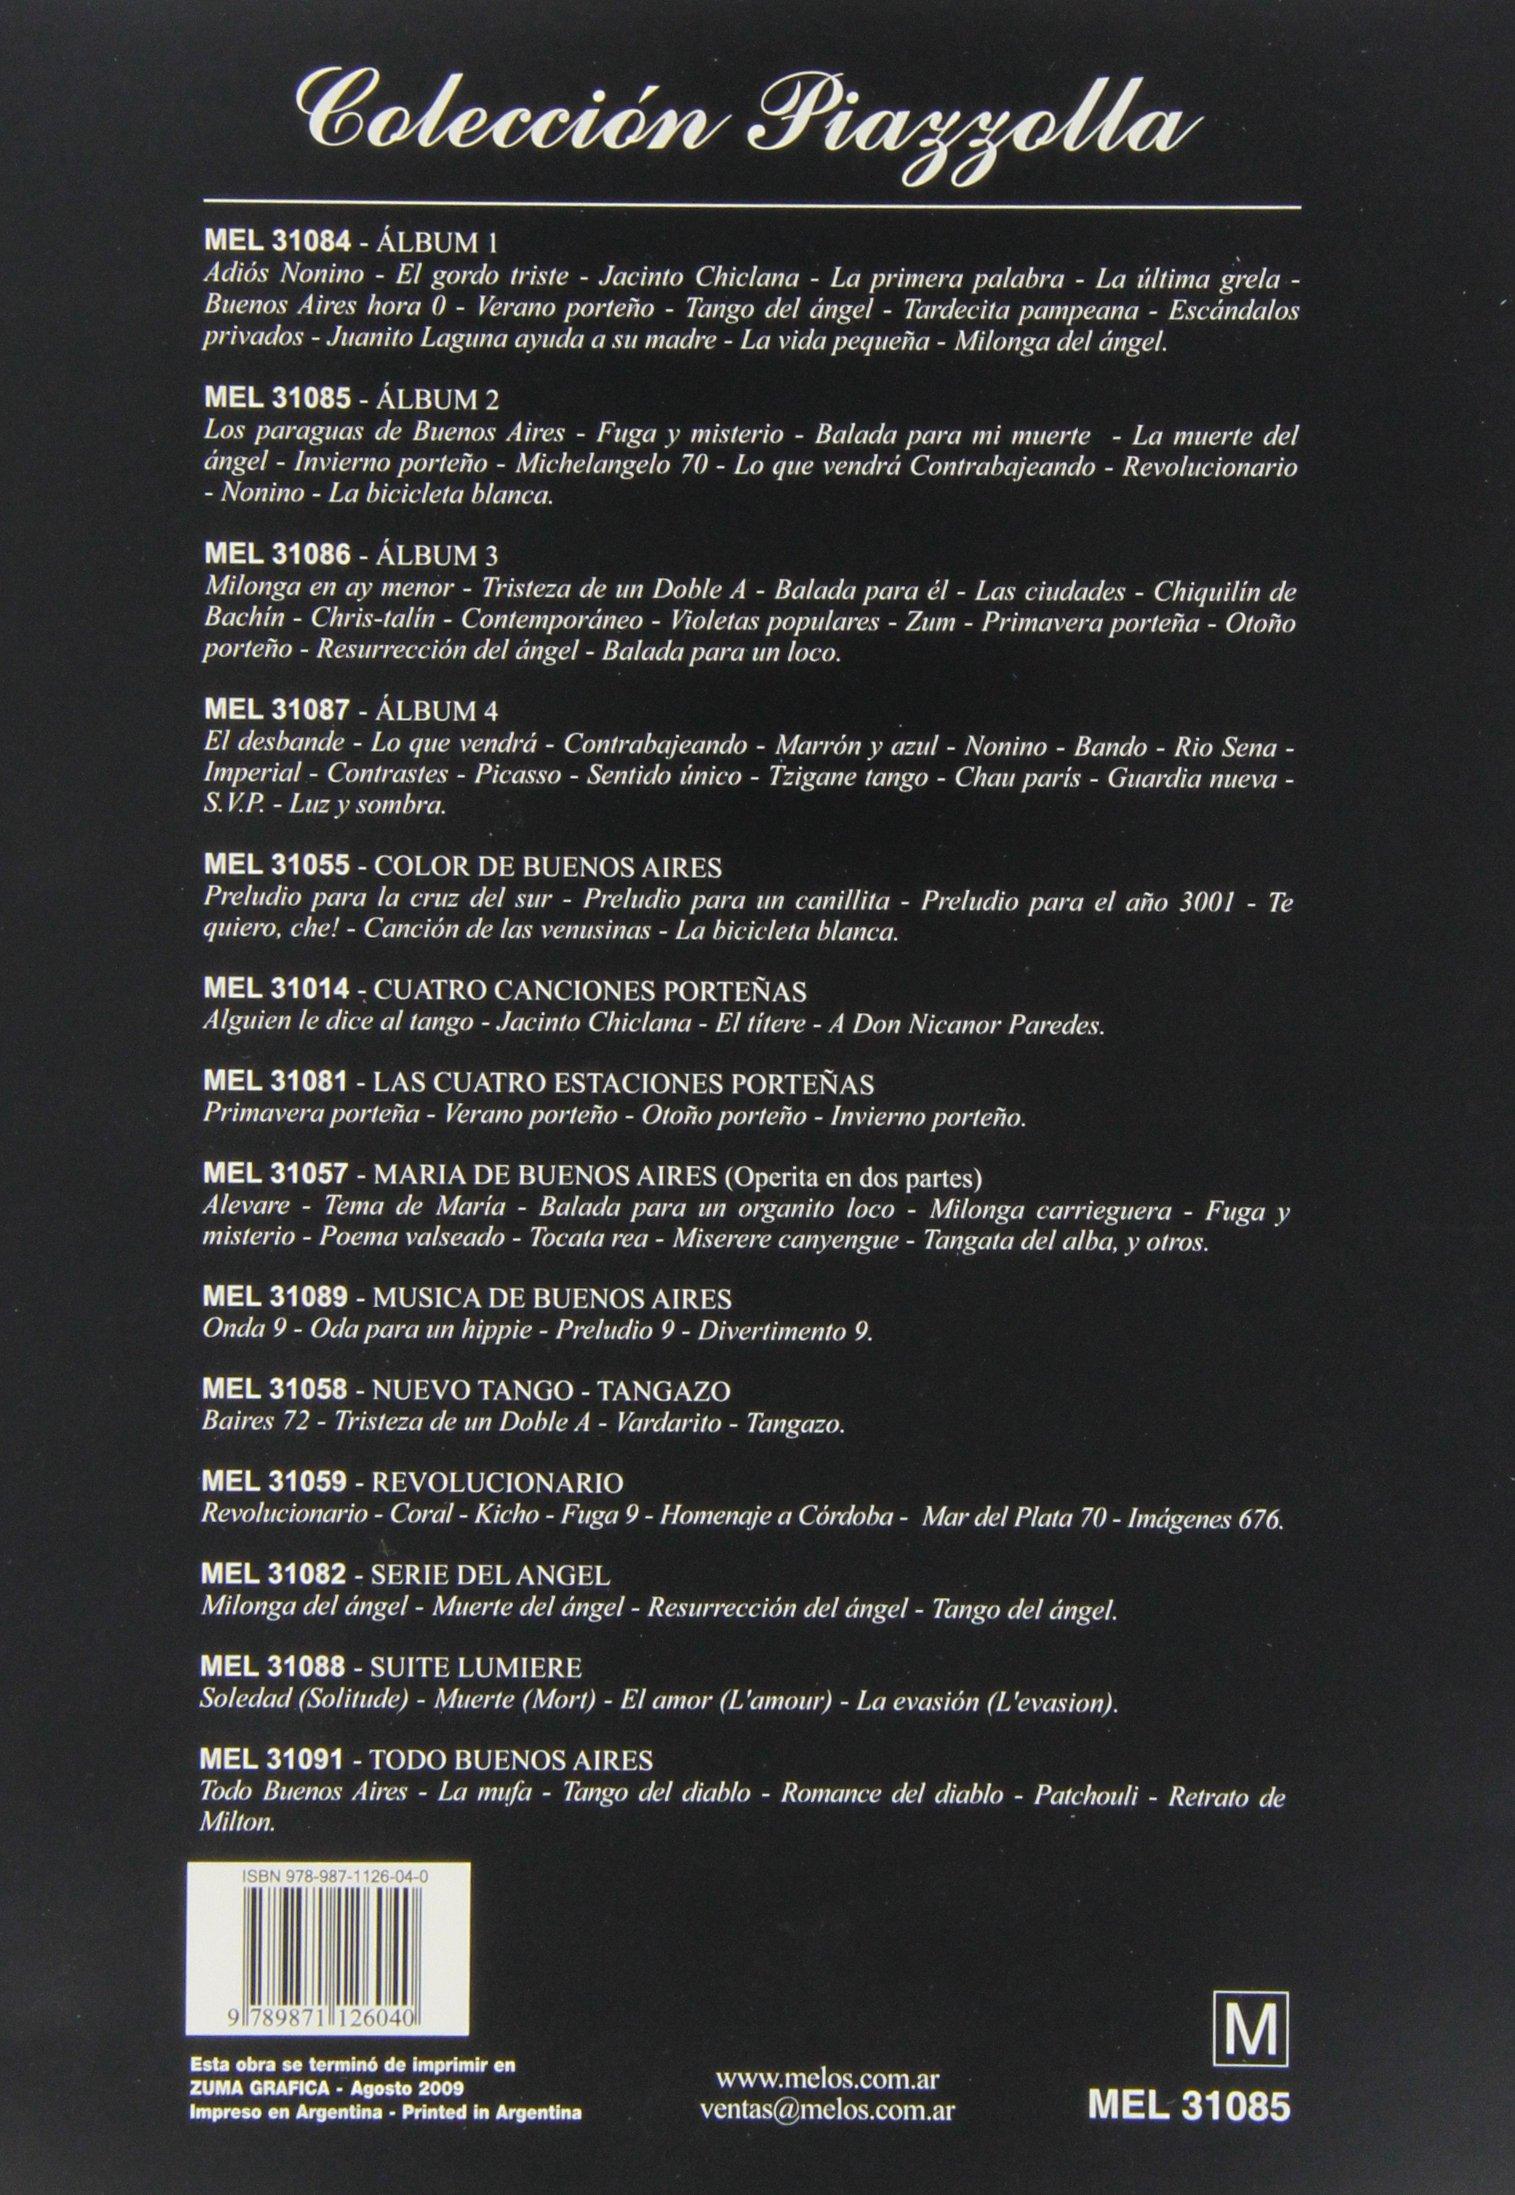 PIAZZOLLA - Album 2º para Piano: PIAZZOLLA: 9789871126040: Amazon.com: Books